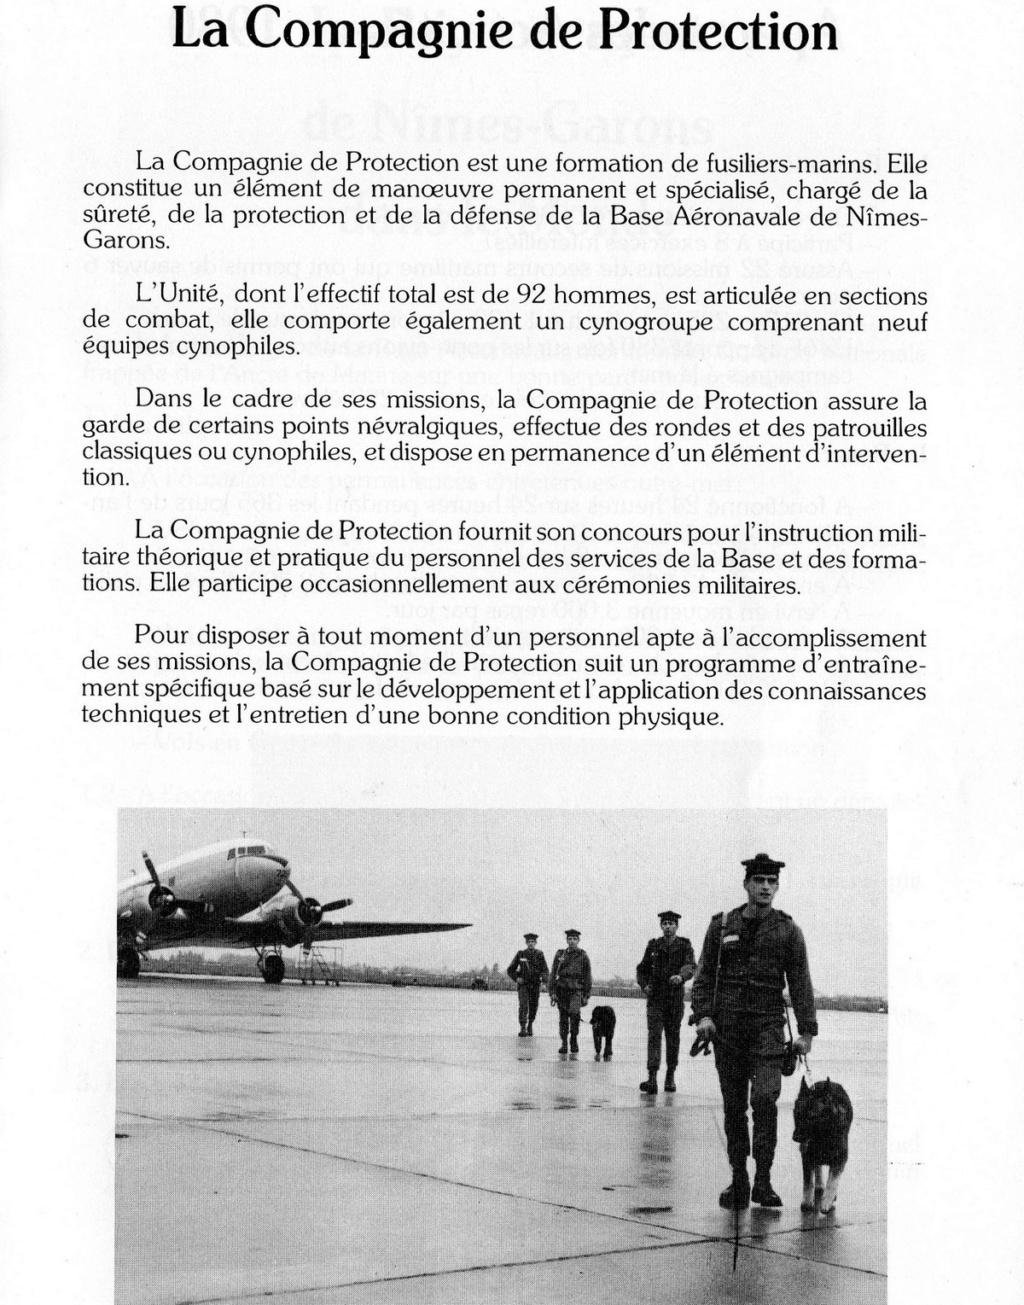 [LES B.A.N.] NÎMES GARONS - Page 4 Img66910